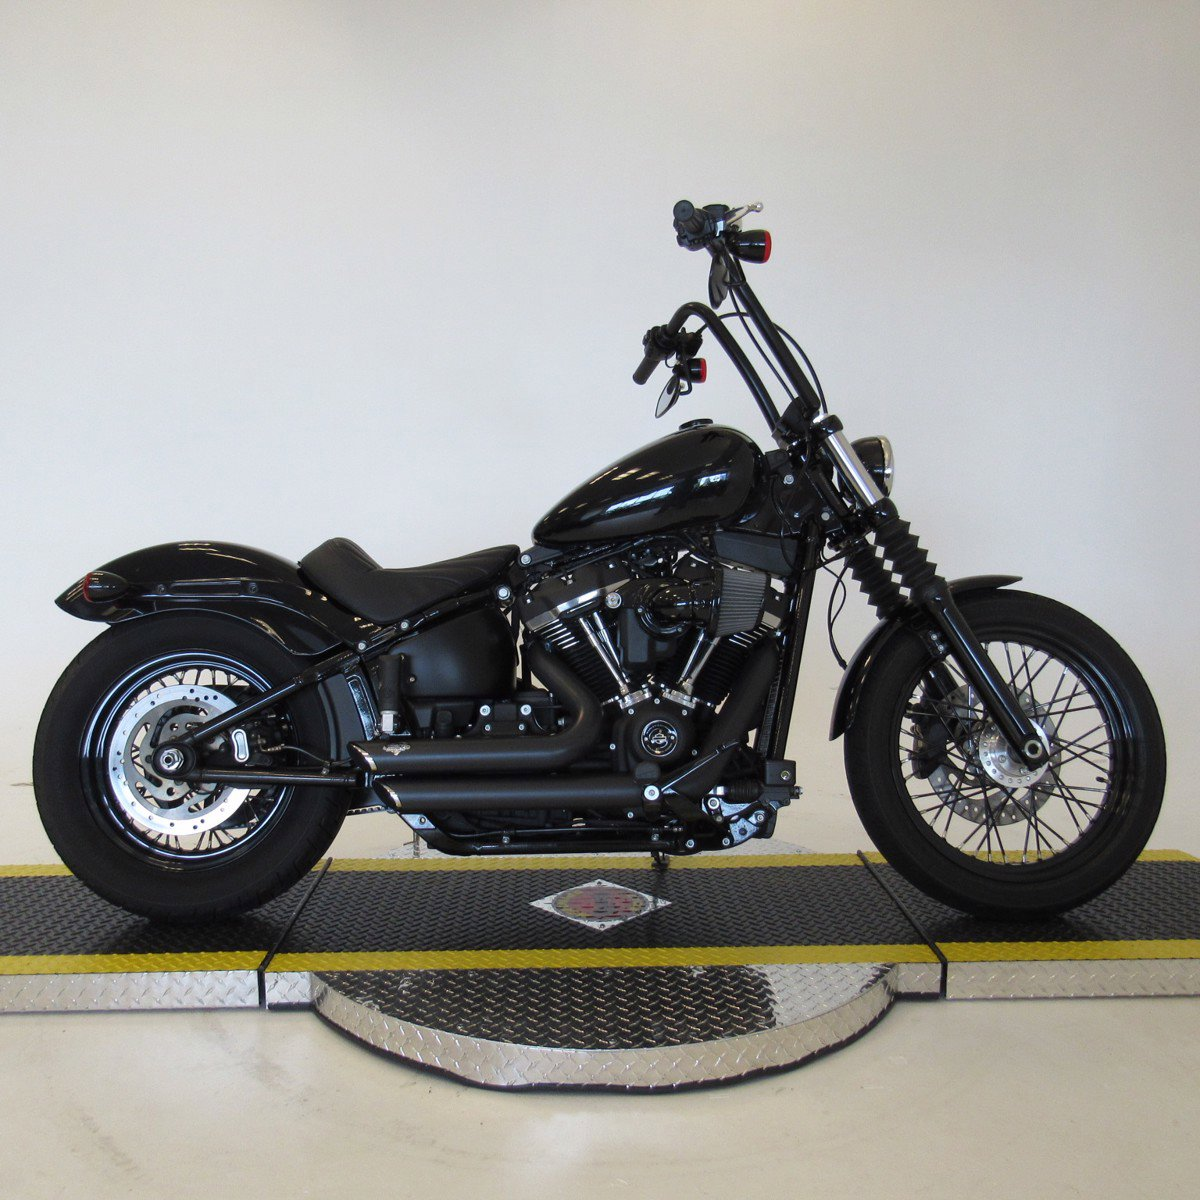 Pre-Owned 2020 Harley-Davidson Softail Street Bob FXBB